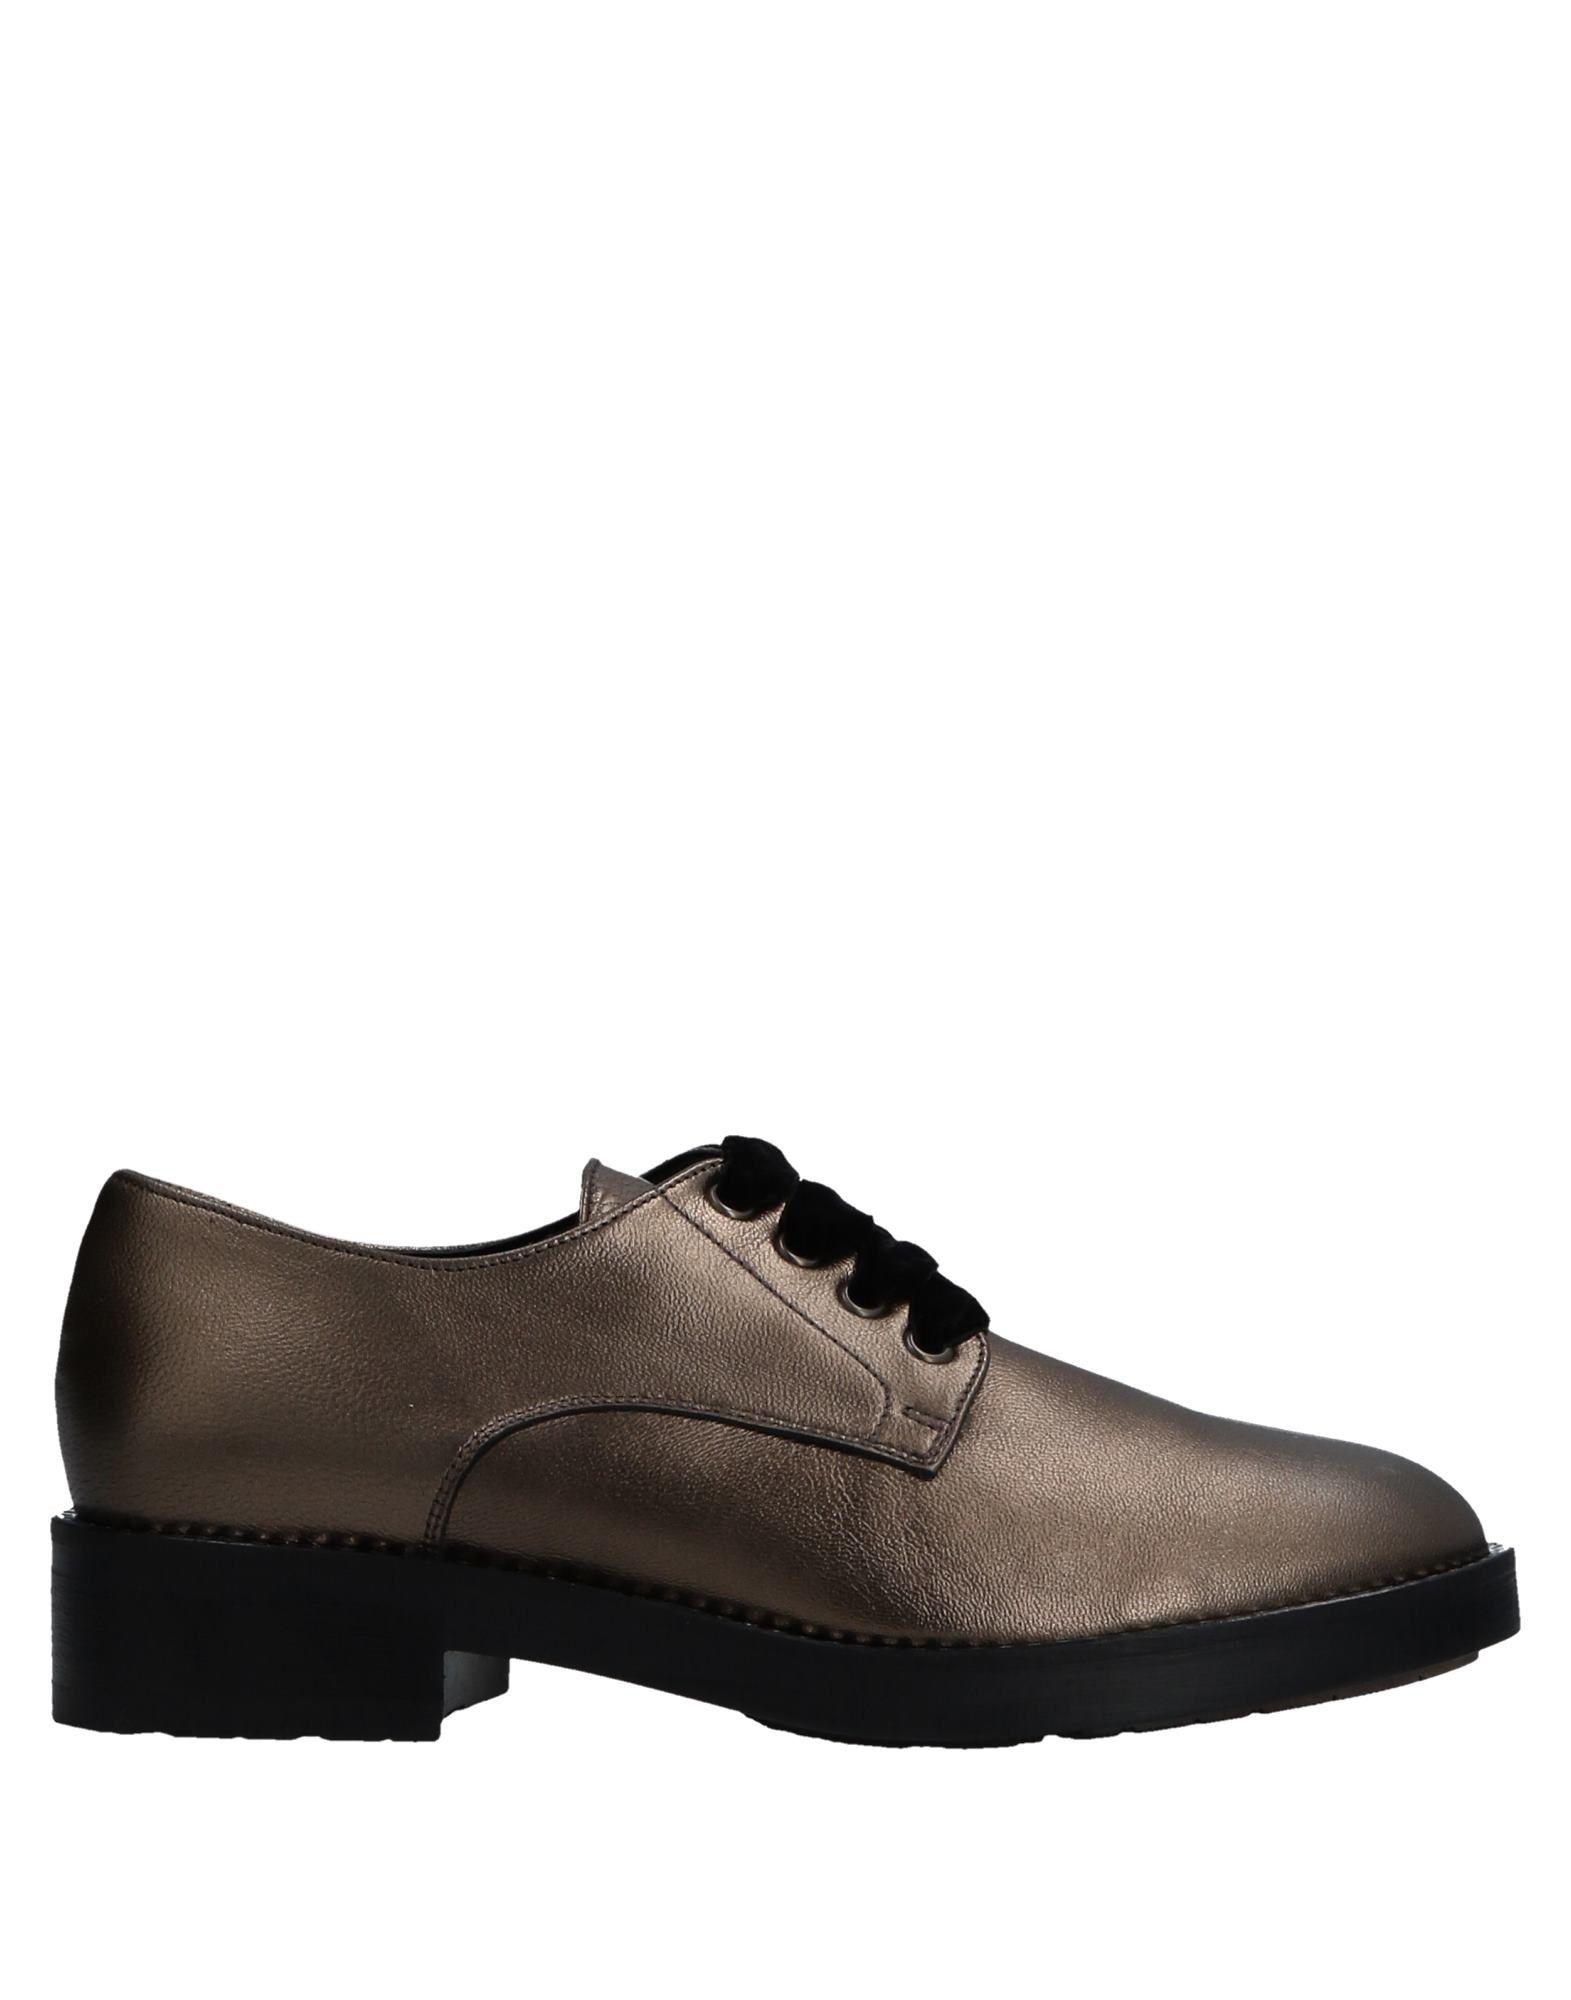 CHOCOLÀ Обувь на шнурках обувь обувь обувь обувь обувь обувь обувь обувь обувь обувь обувь обувь обувь обувь обувь мужская обувь обувь 3603 темно синяя 40 метров